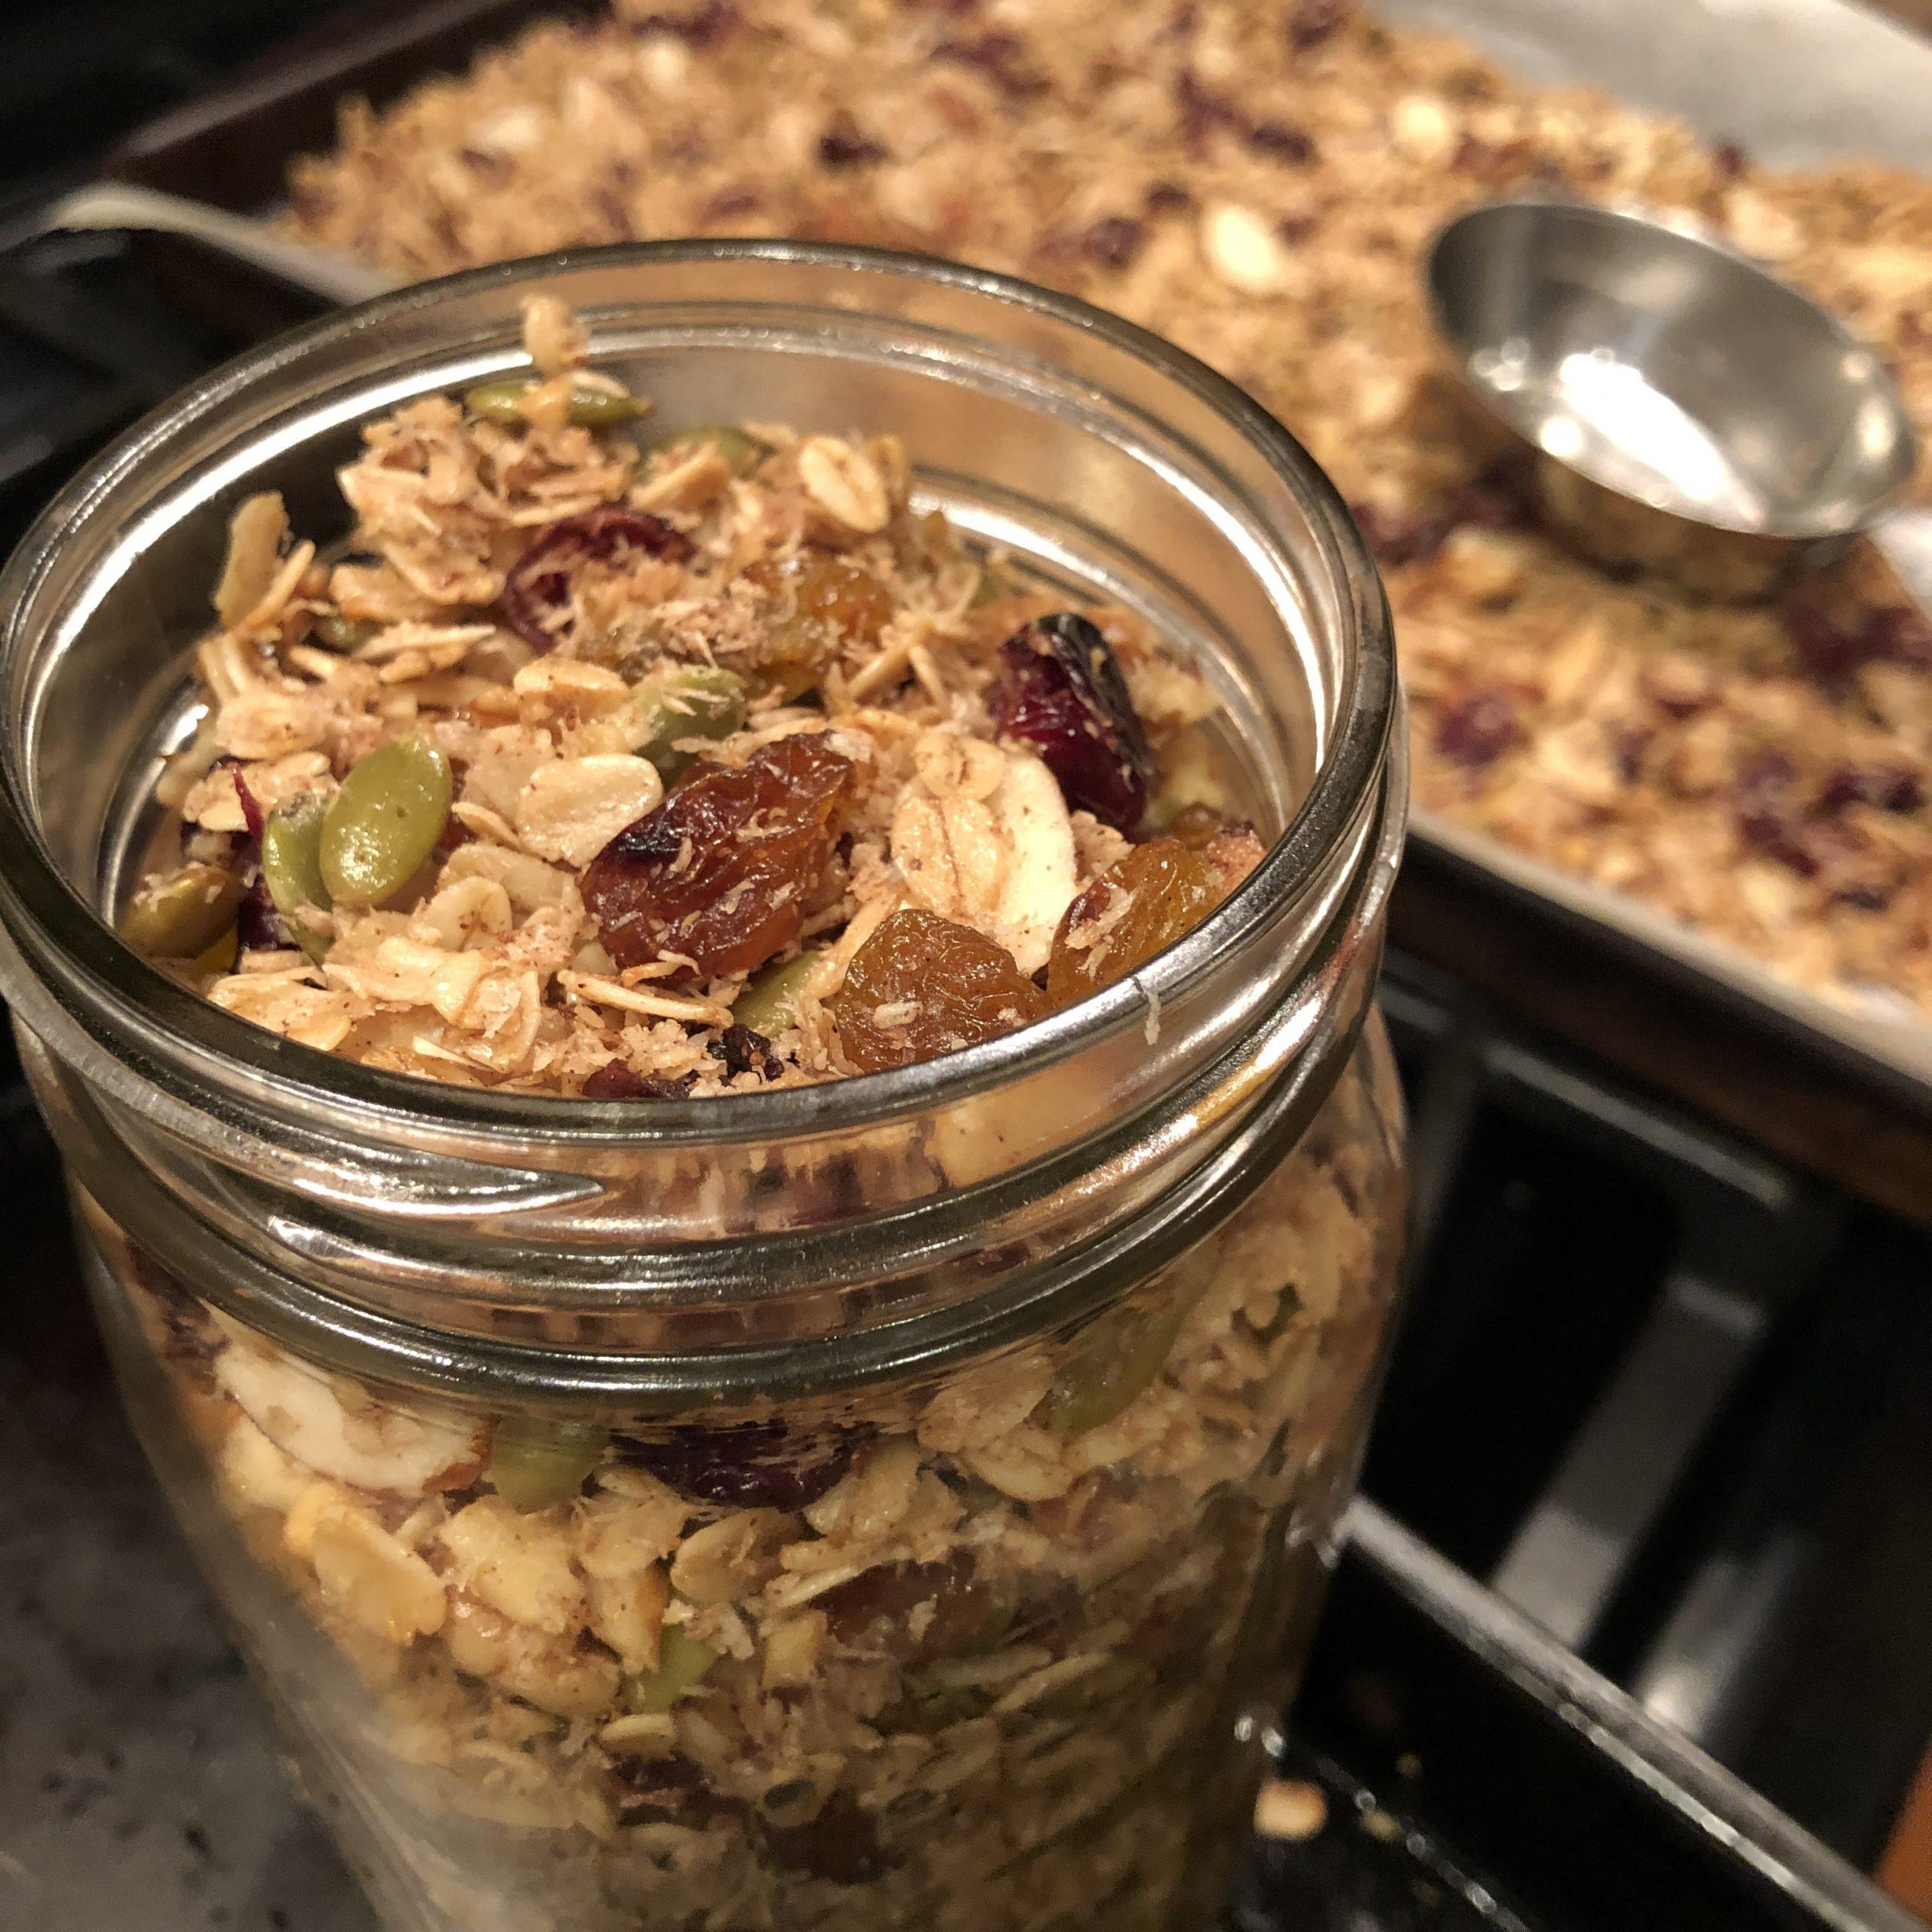 Mason jar full of homemade granola